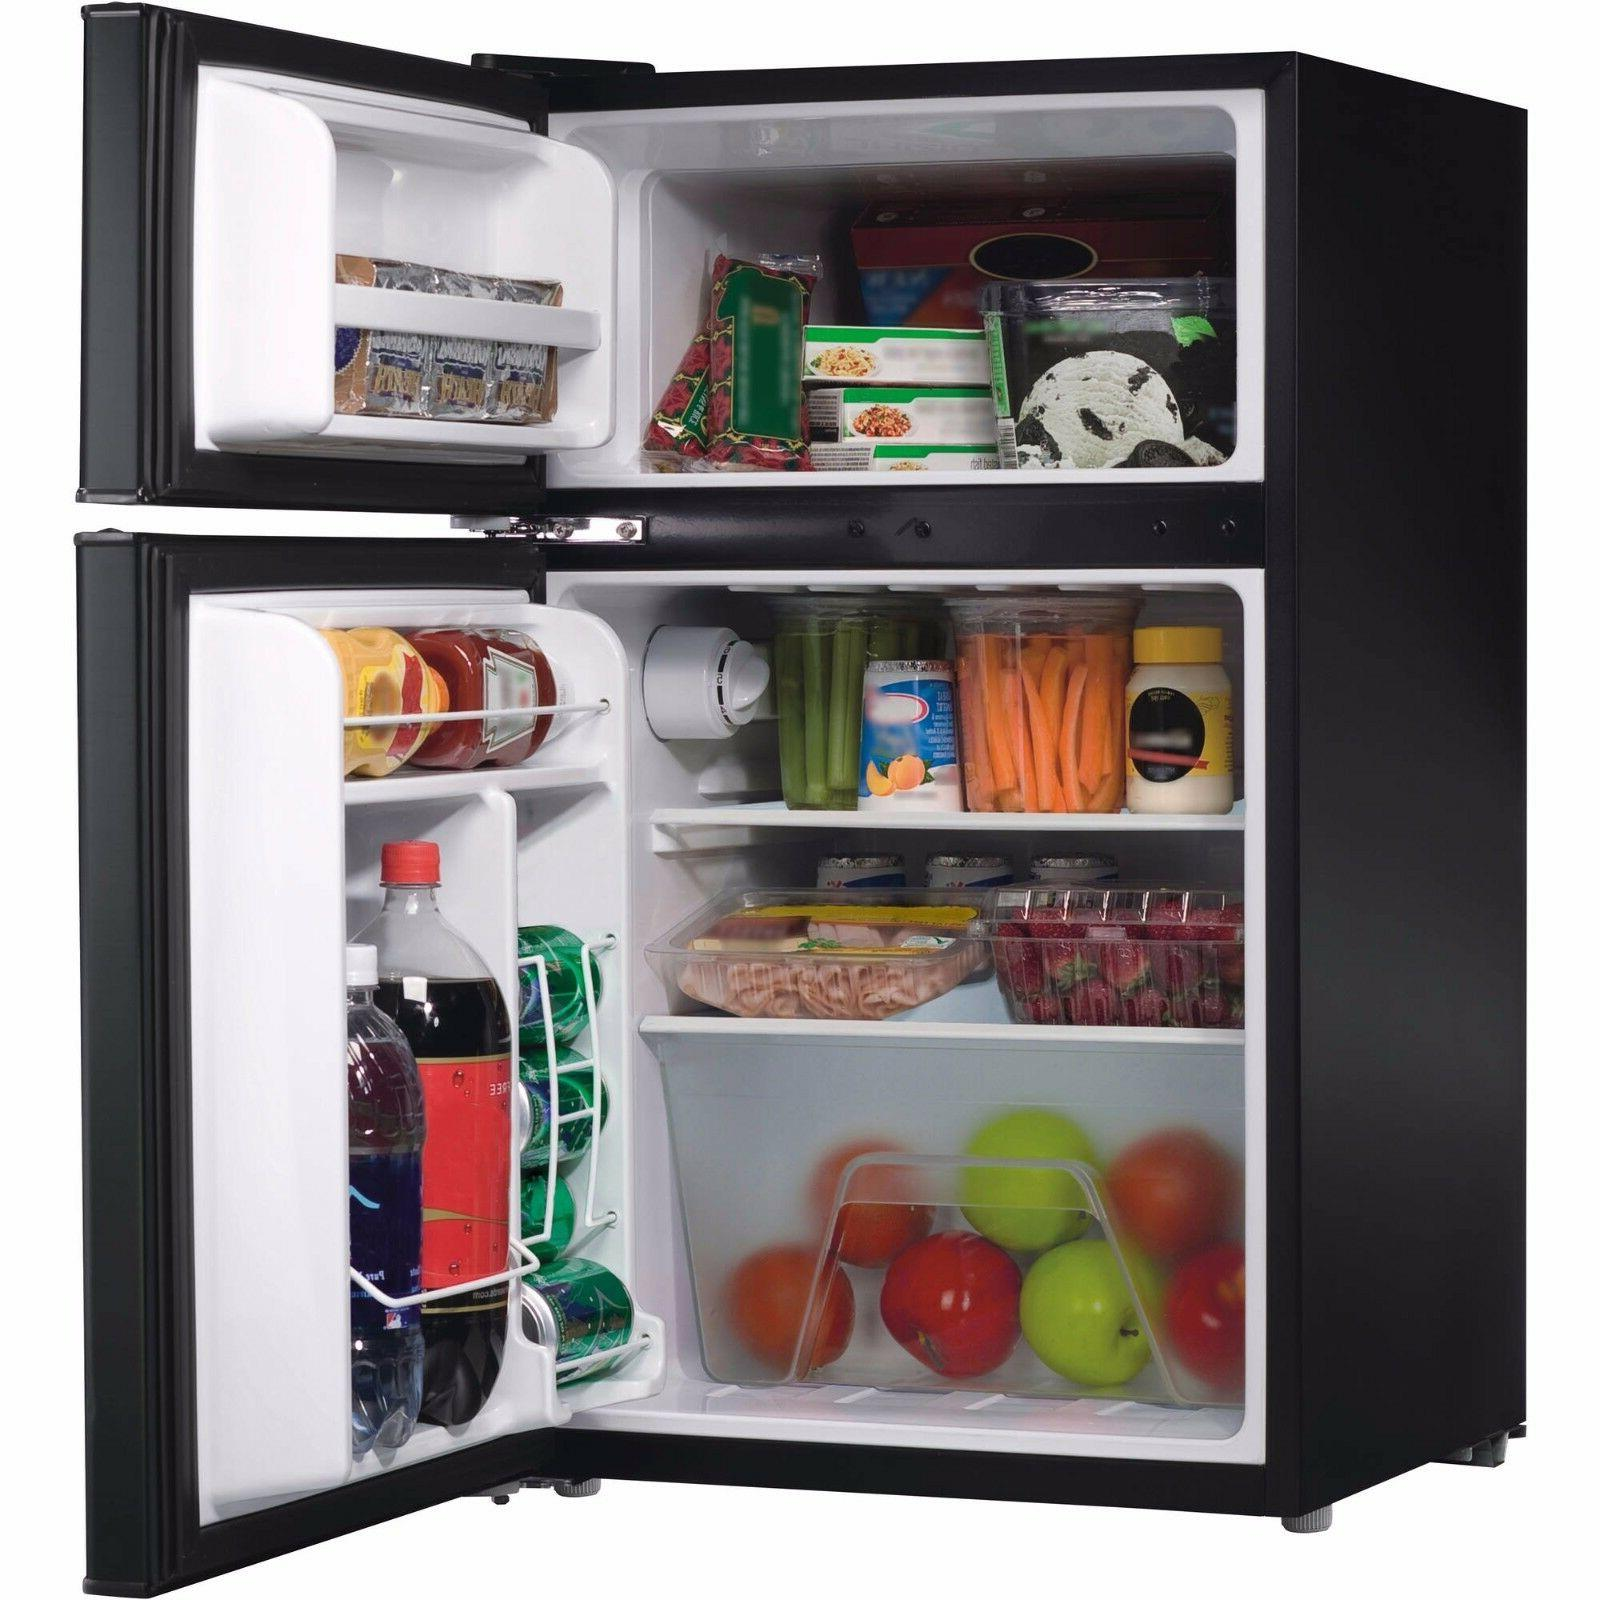 Galanz Compact Refrigerator Black